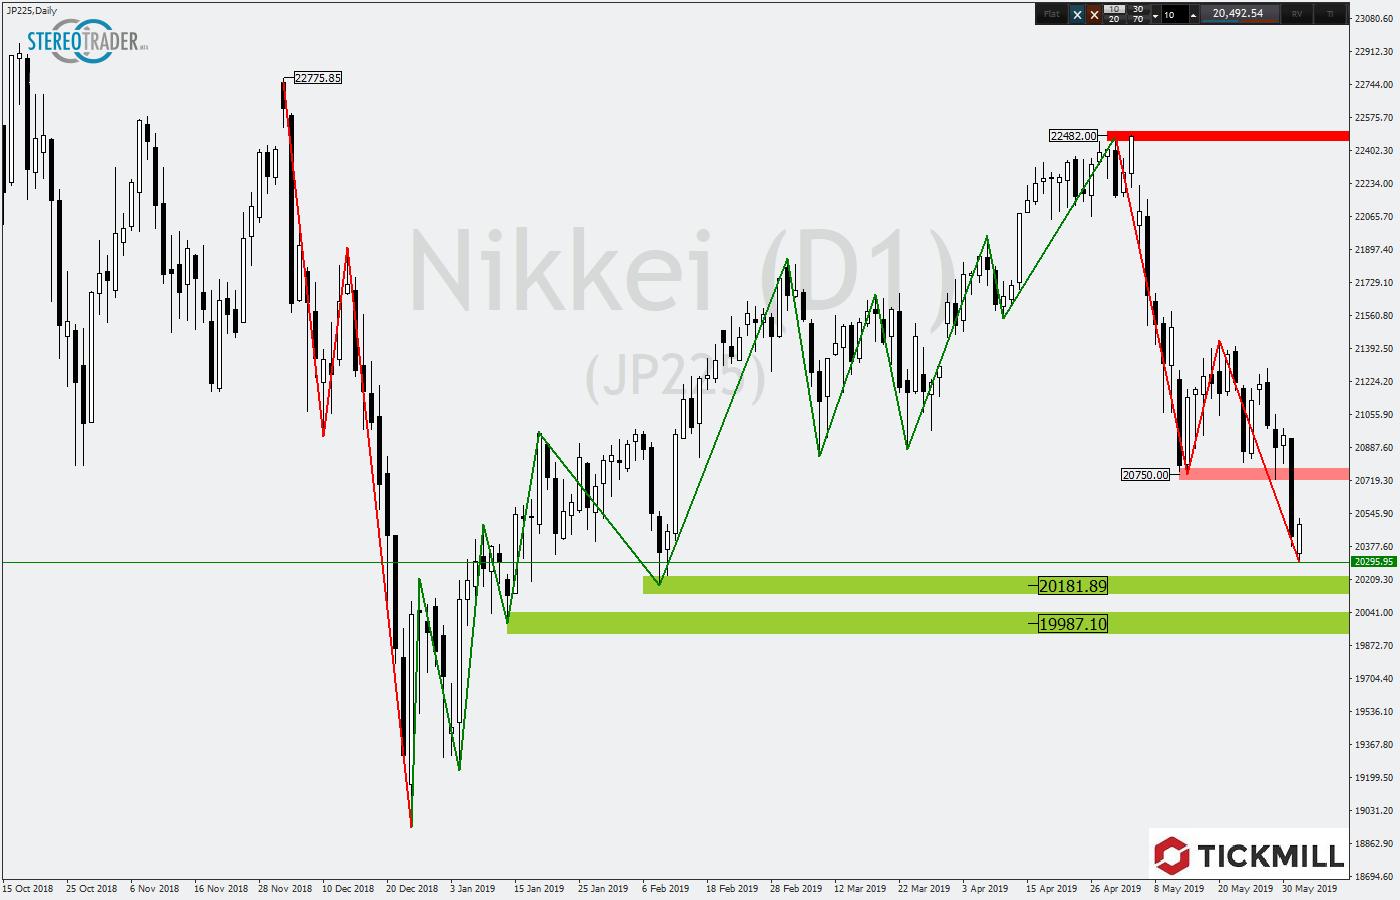 Chartanalyse Nikkei225 im Tageschart